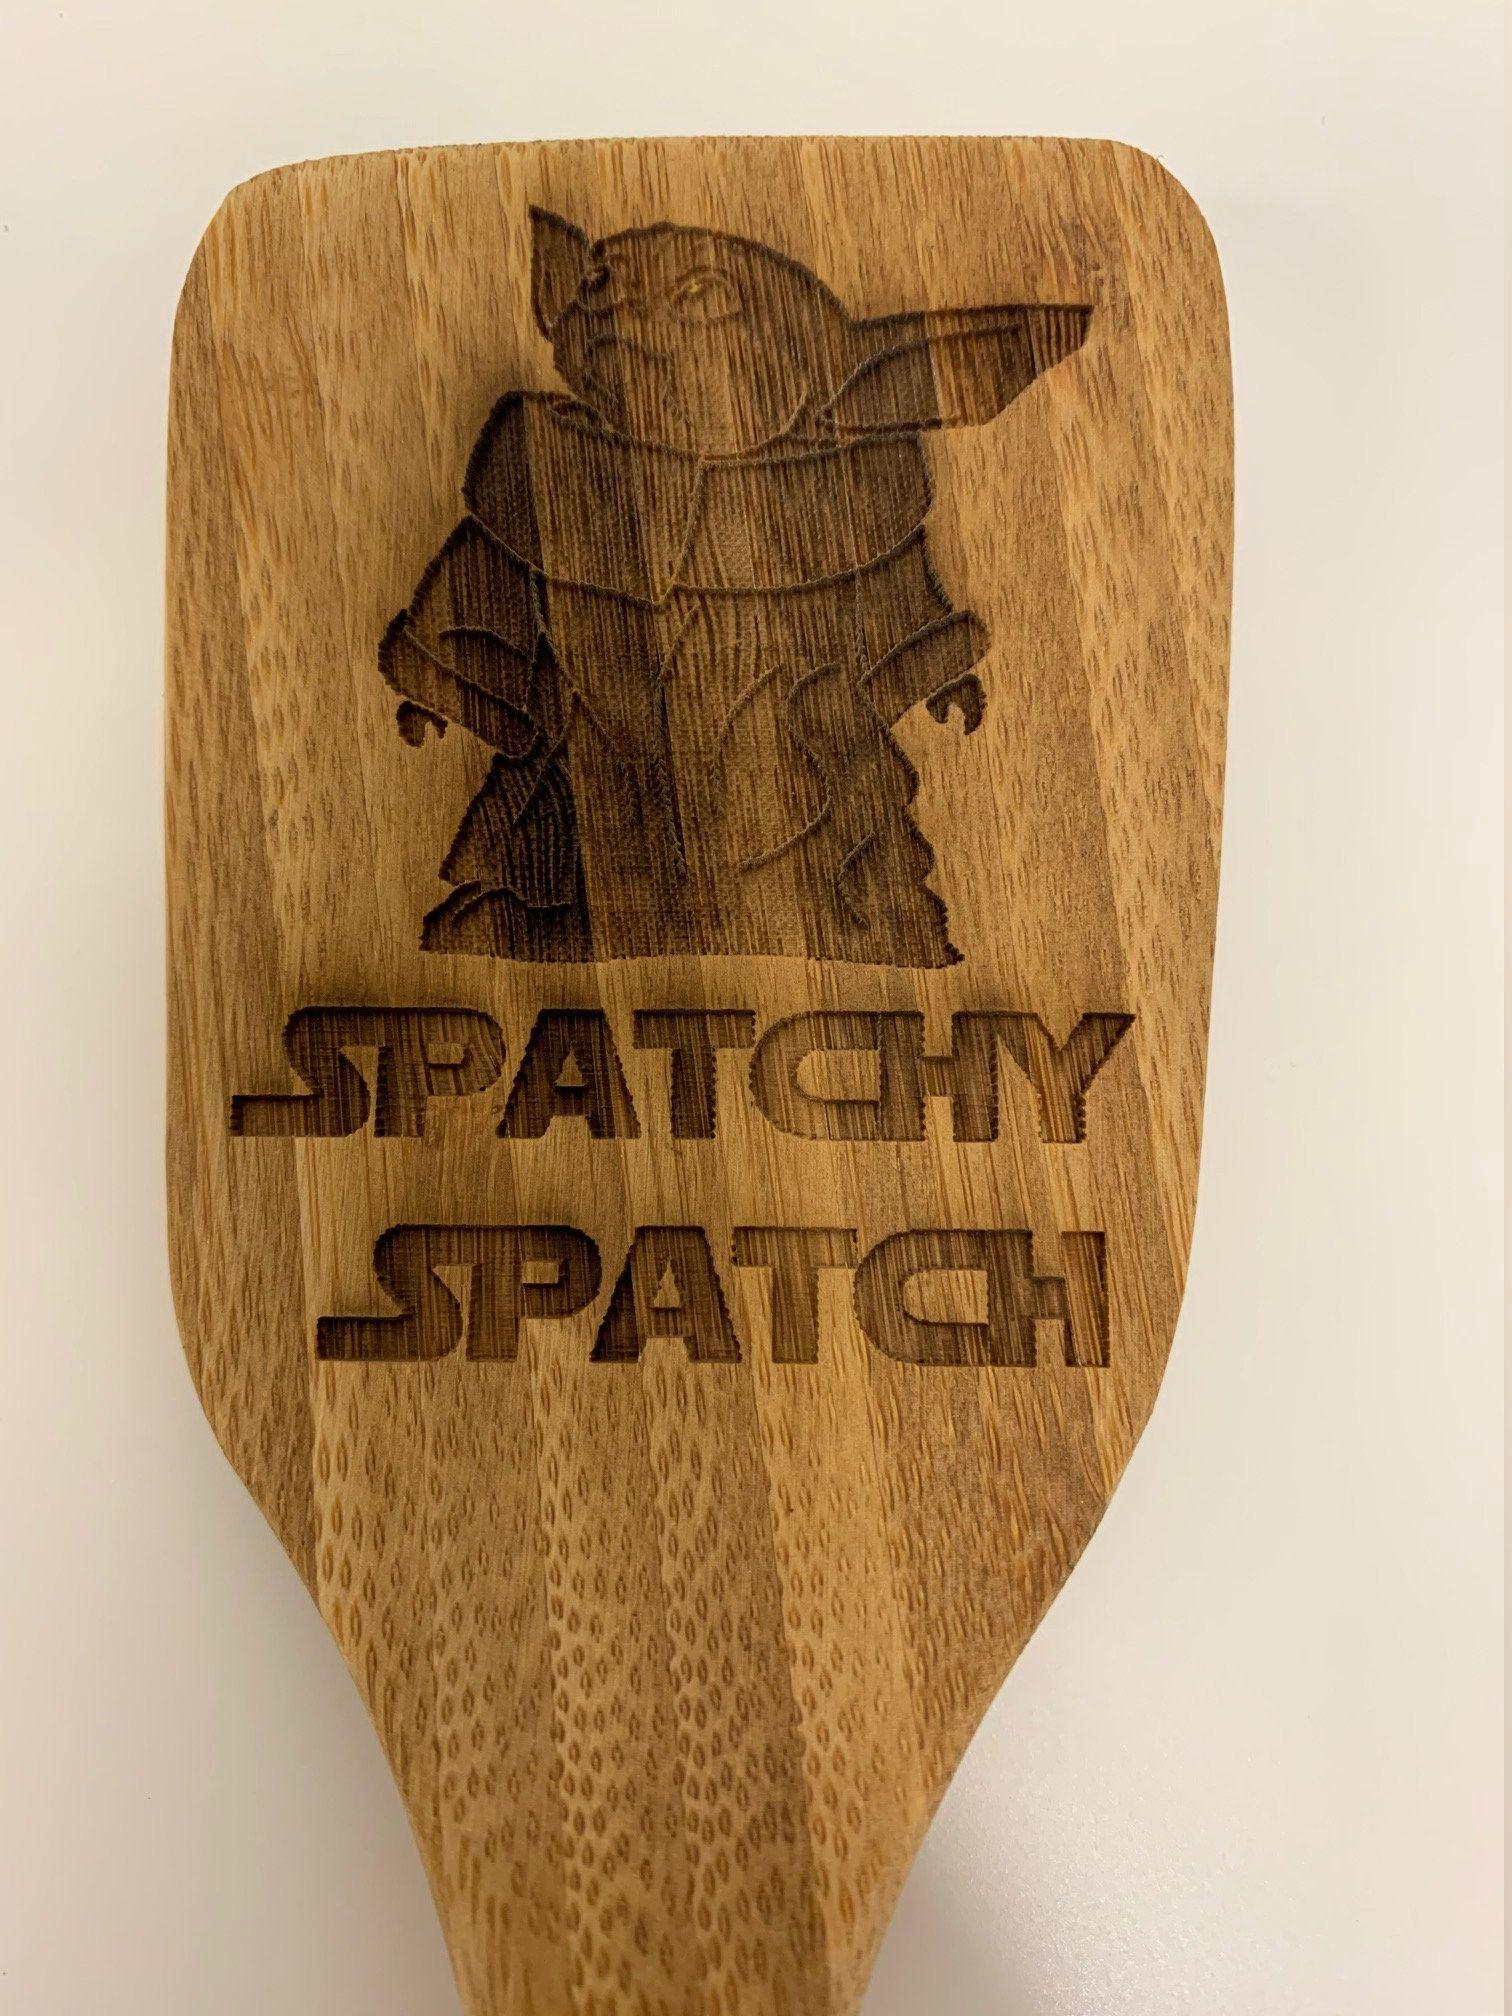 Spatchy Spatch Original Item Laser Etched By Americanstorefront